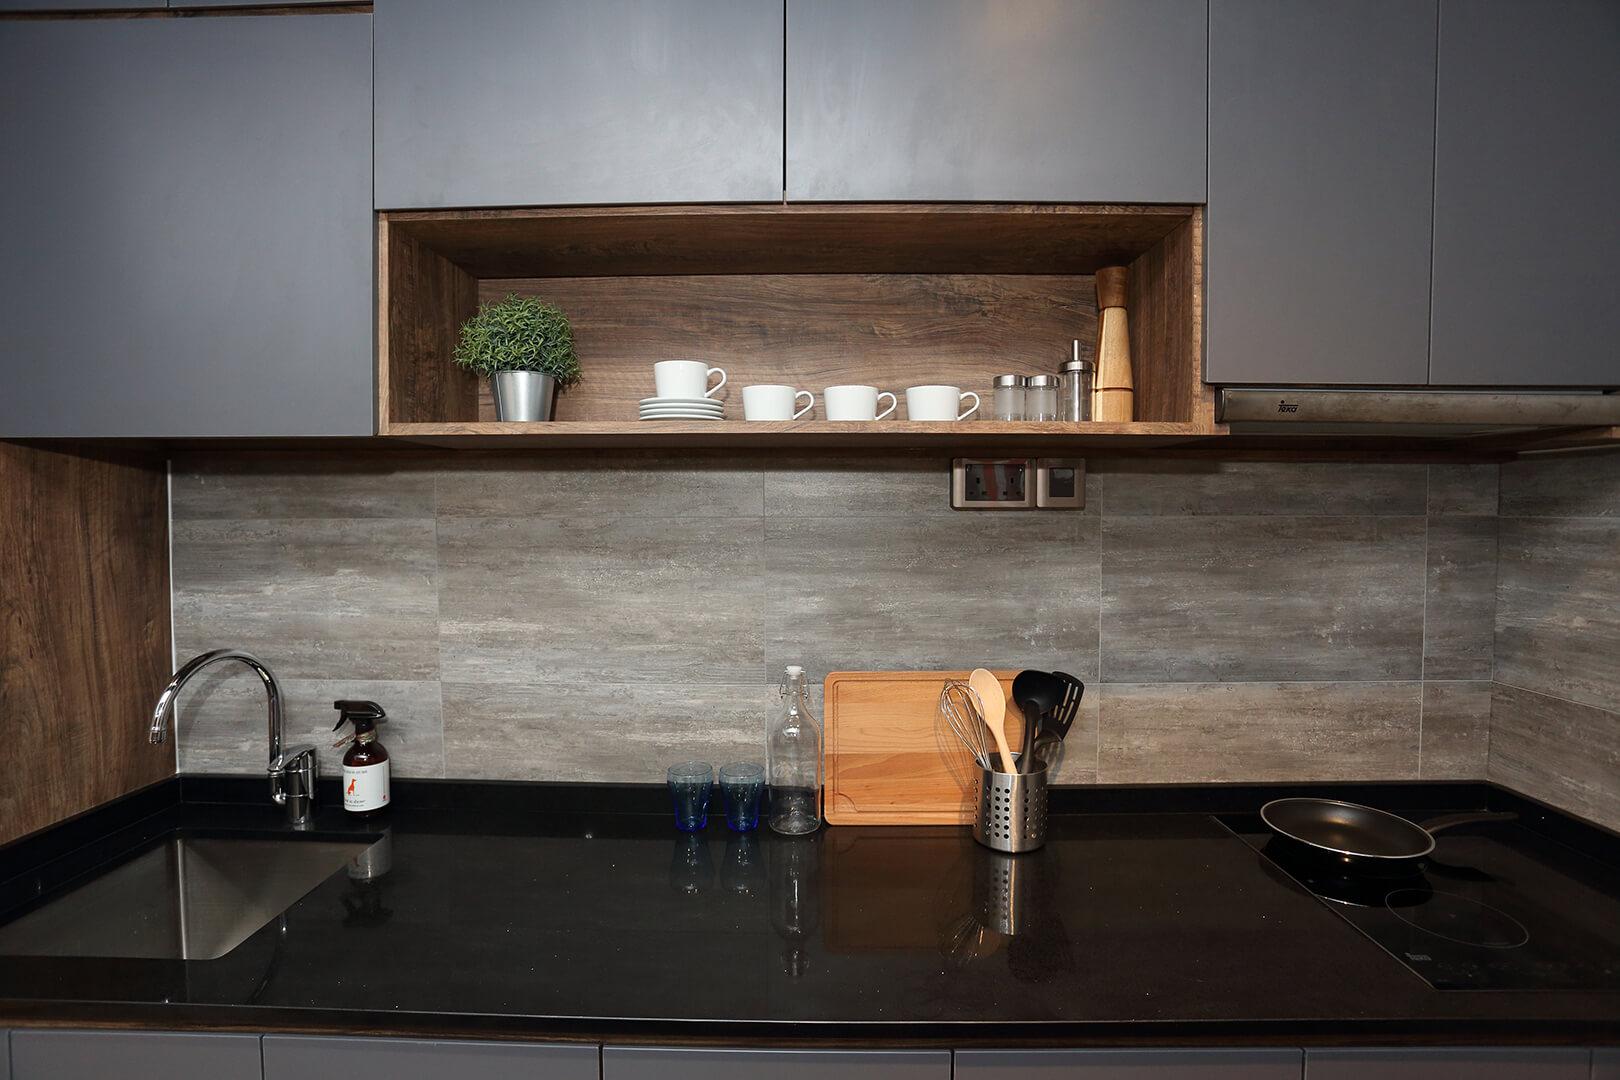 Monoloft's Design Studio Renovation Kitchen Top with Cabinet